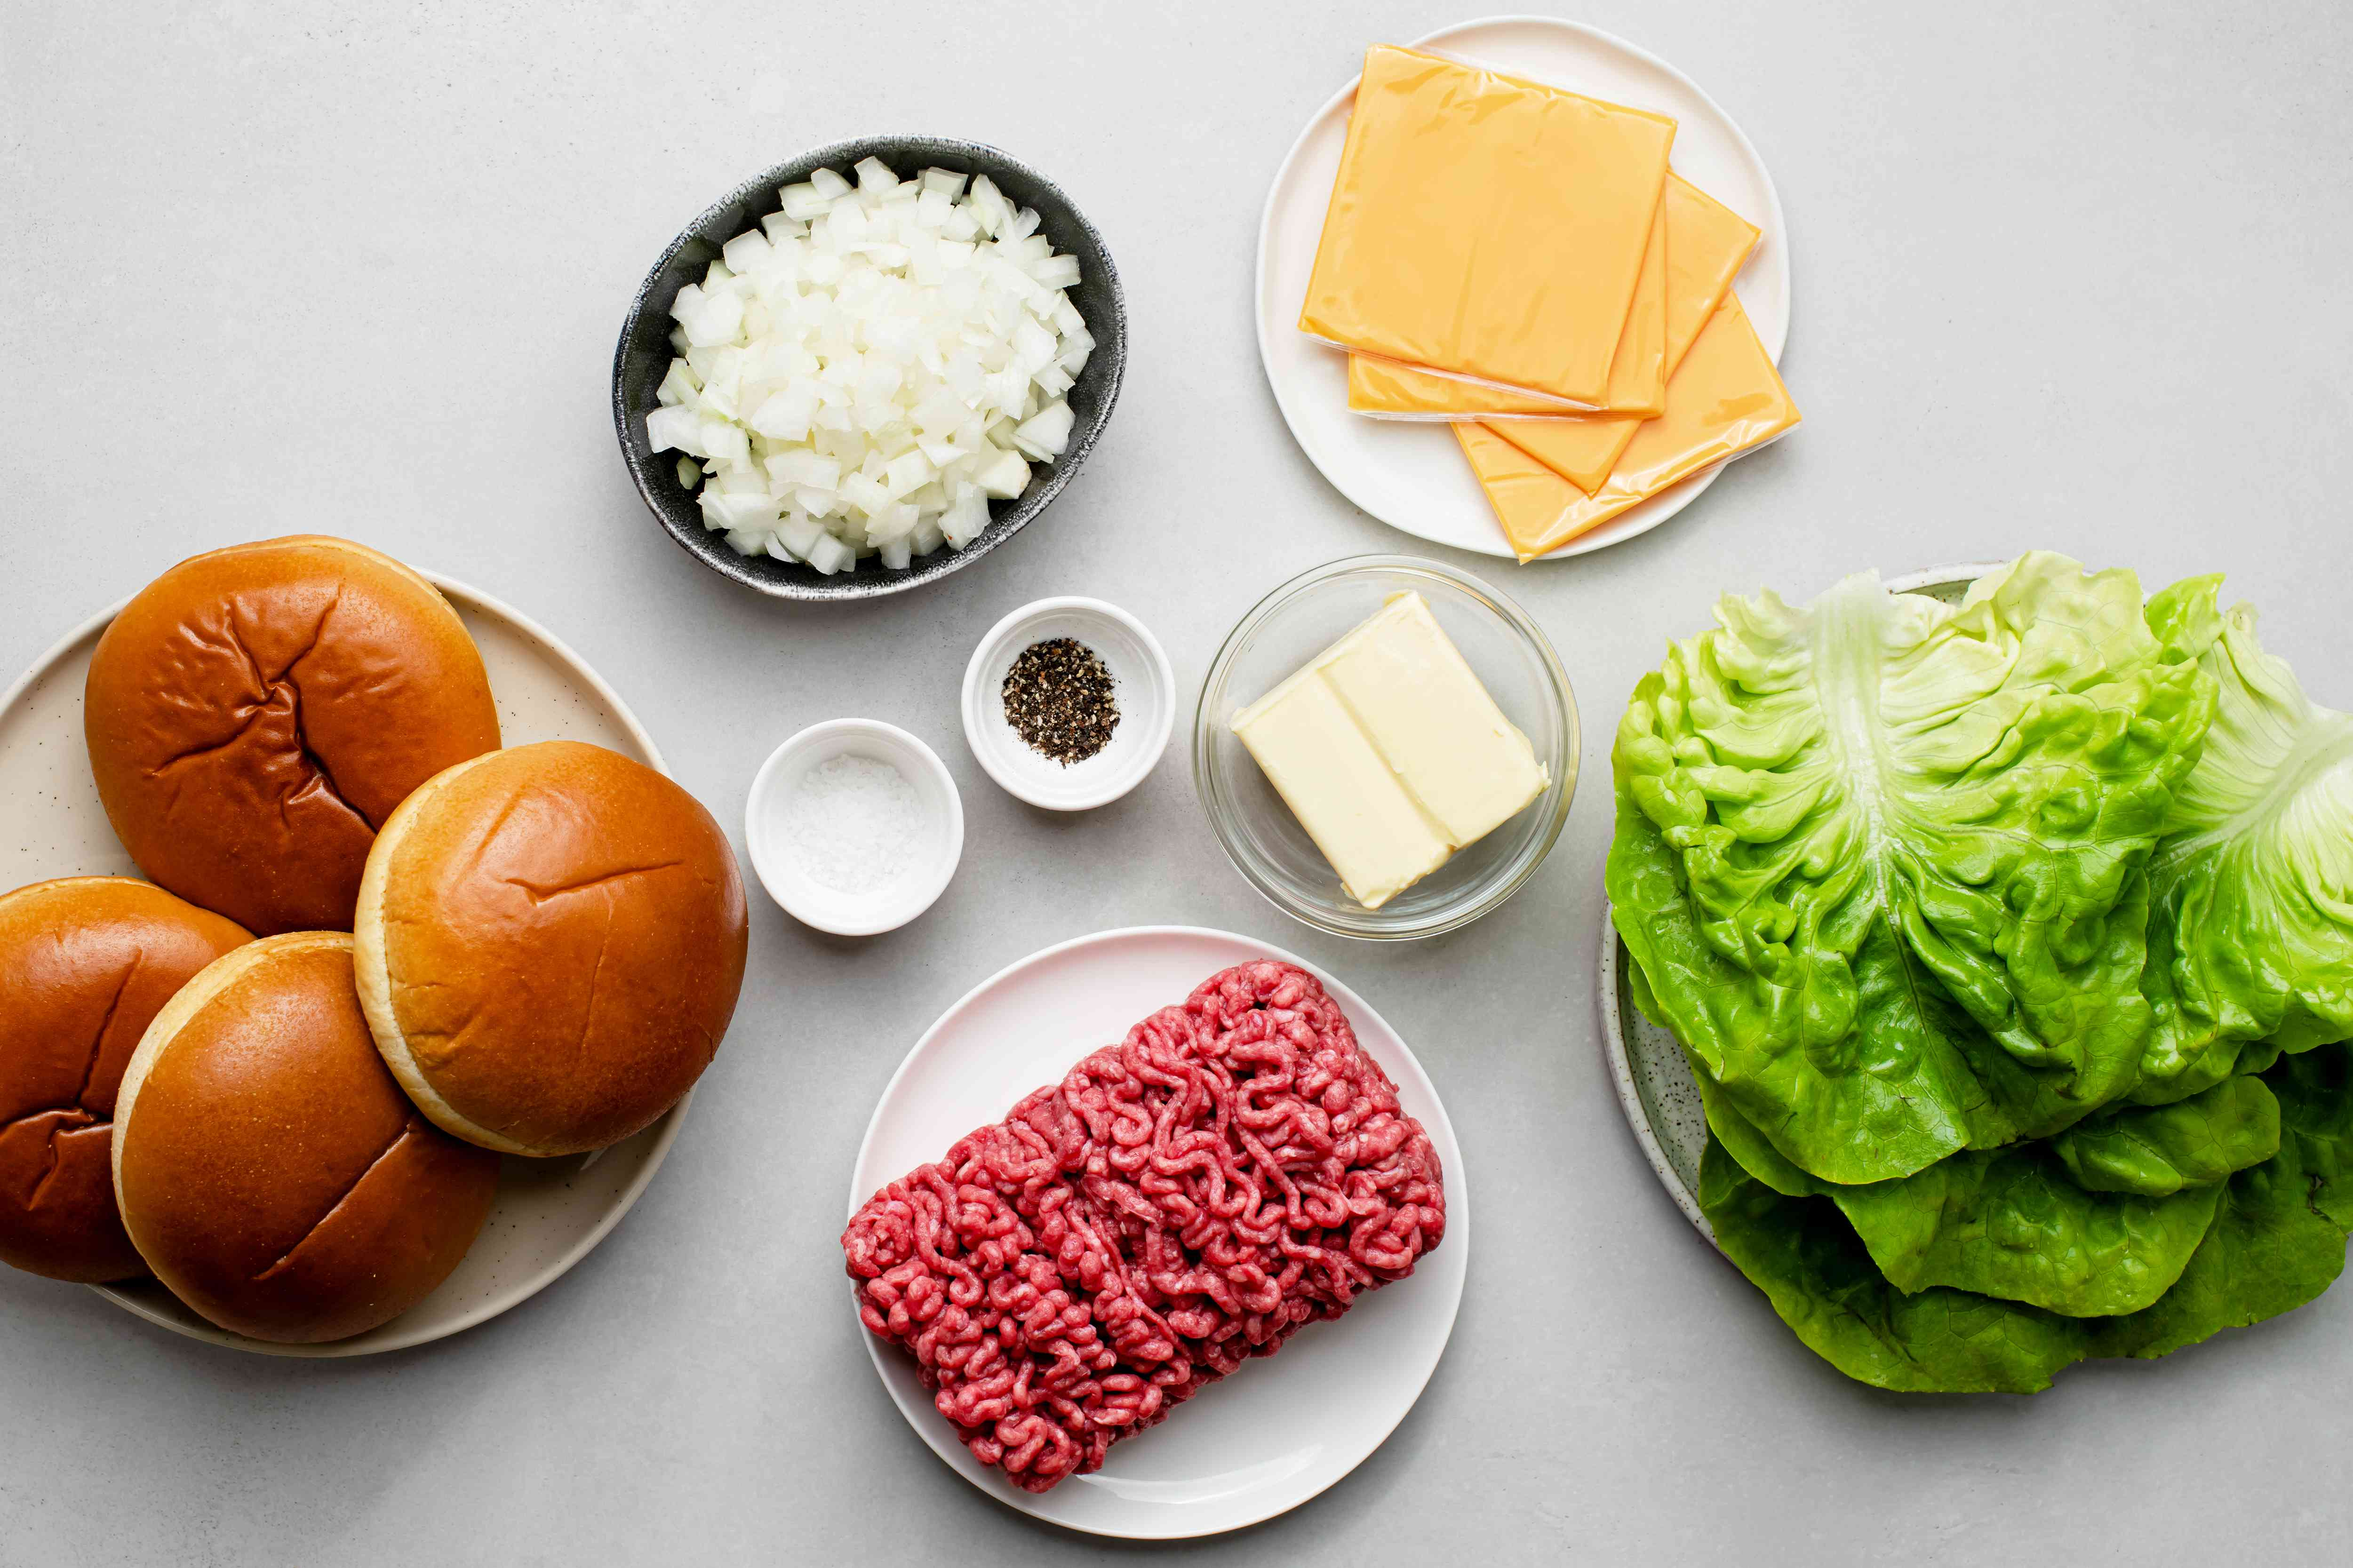 Butter Burgers ingredients